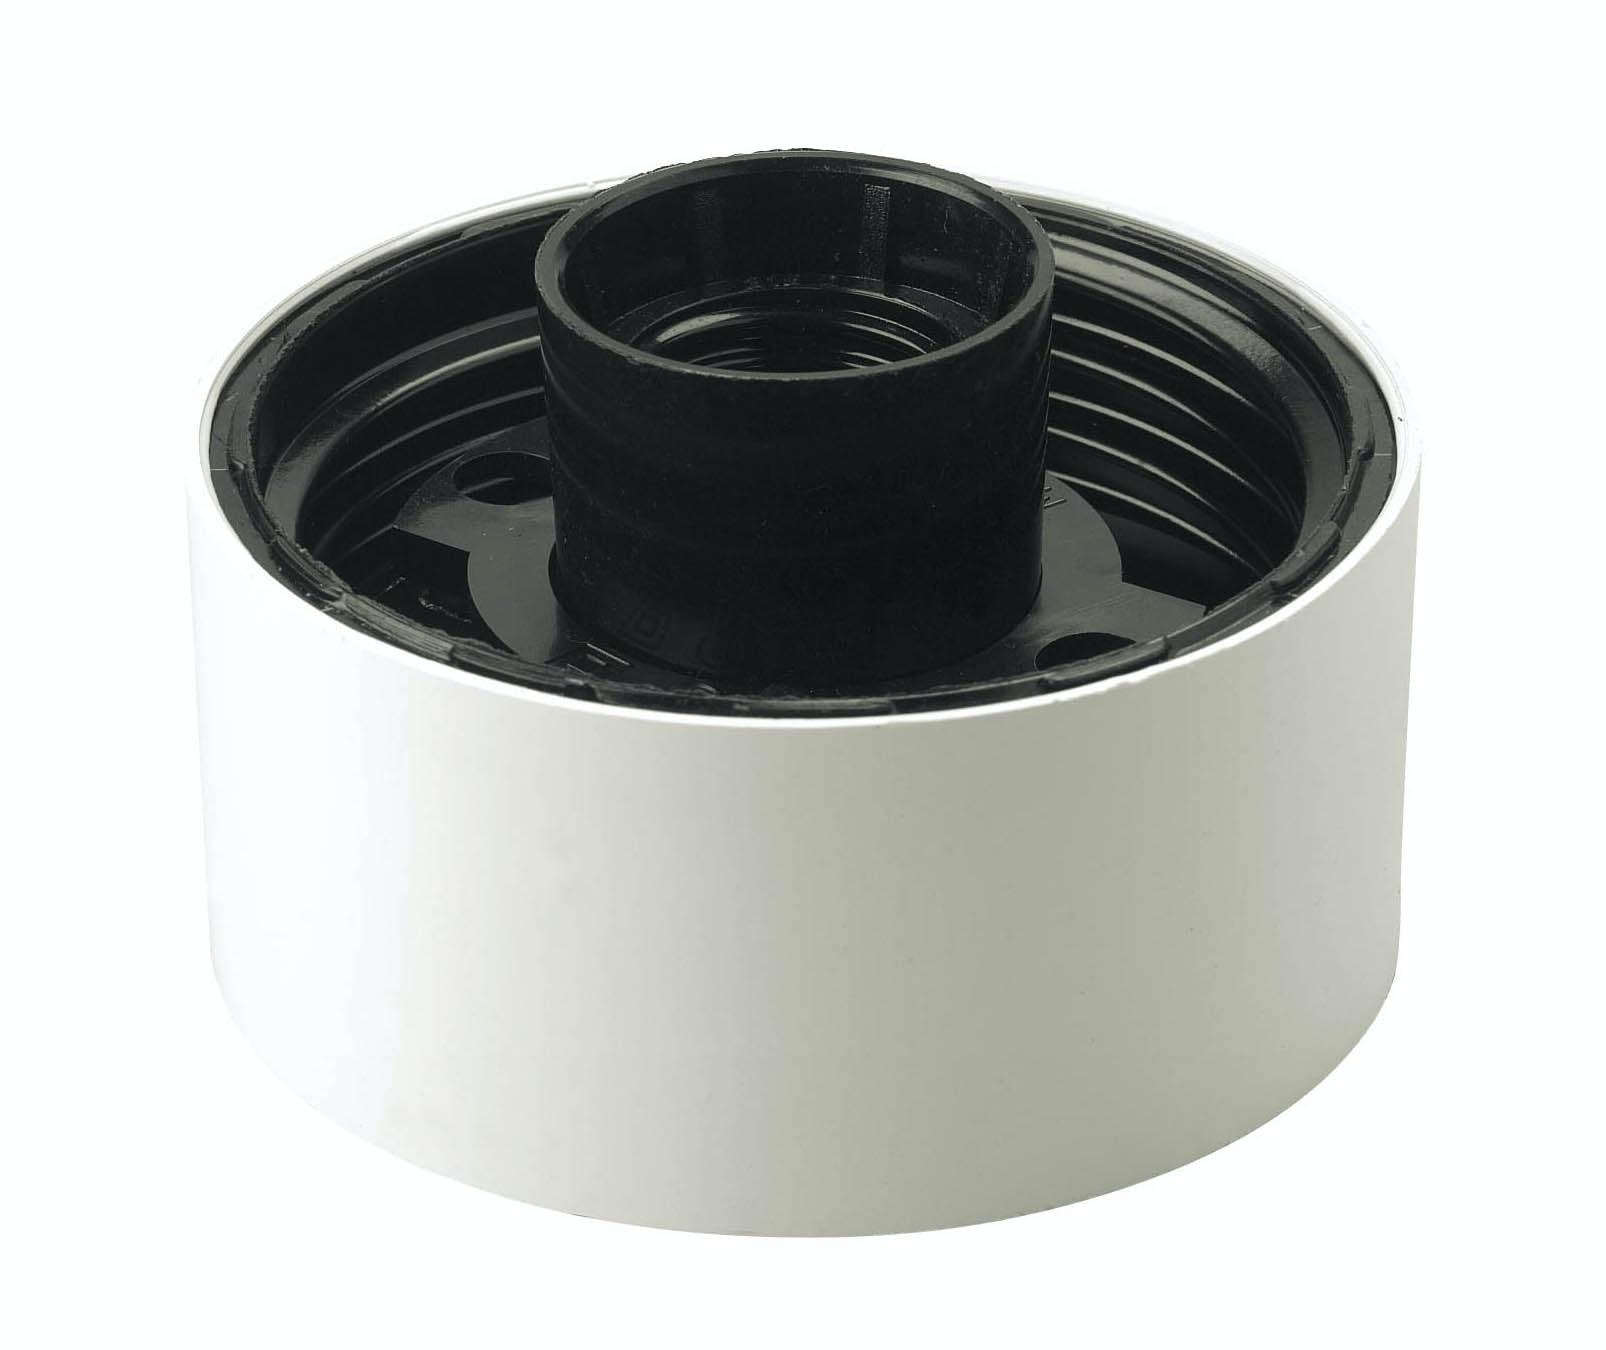 Armatursockel Jo-El Rak Plast Vit 120046